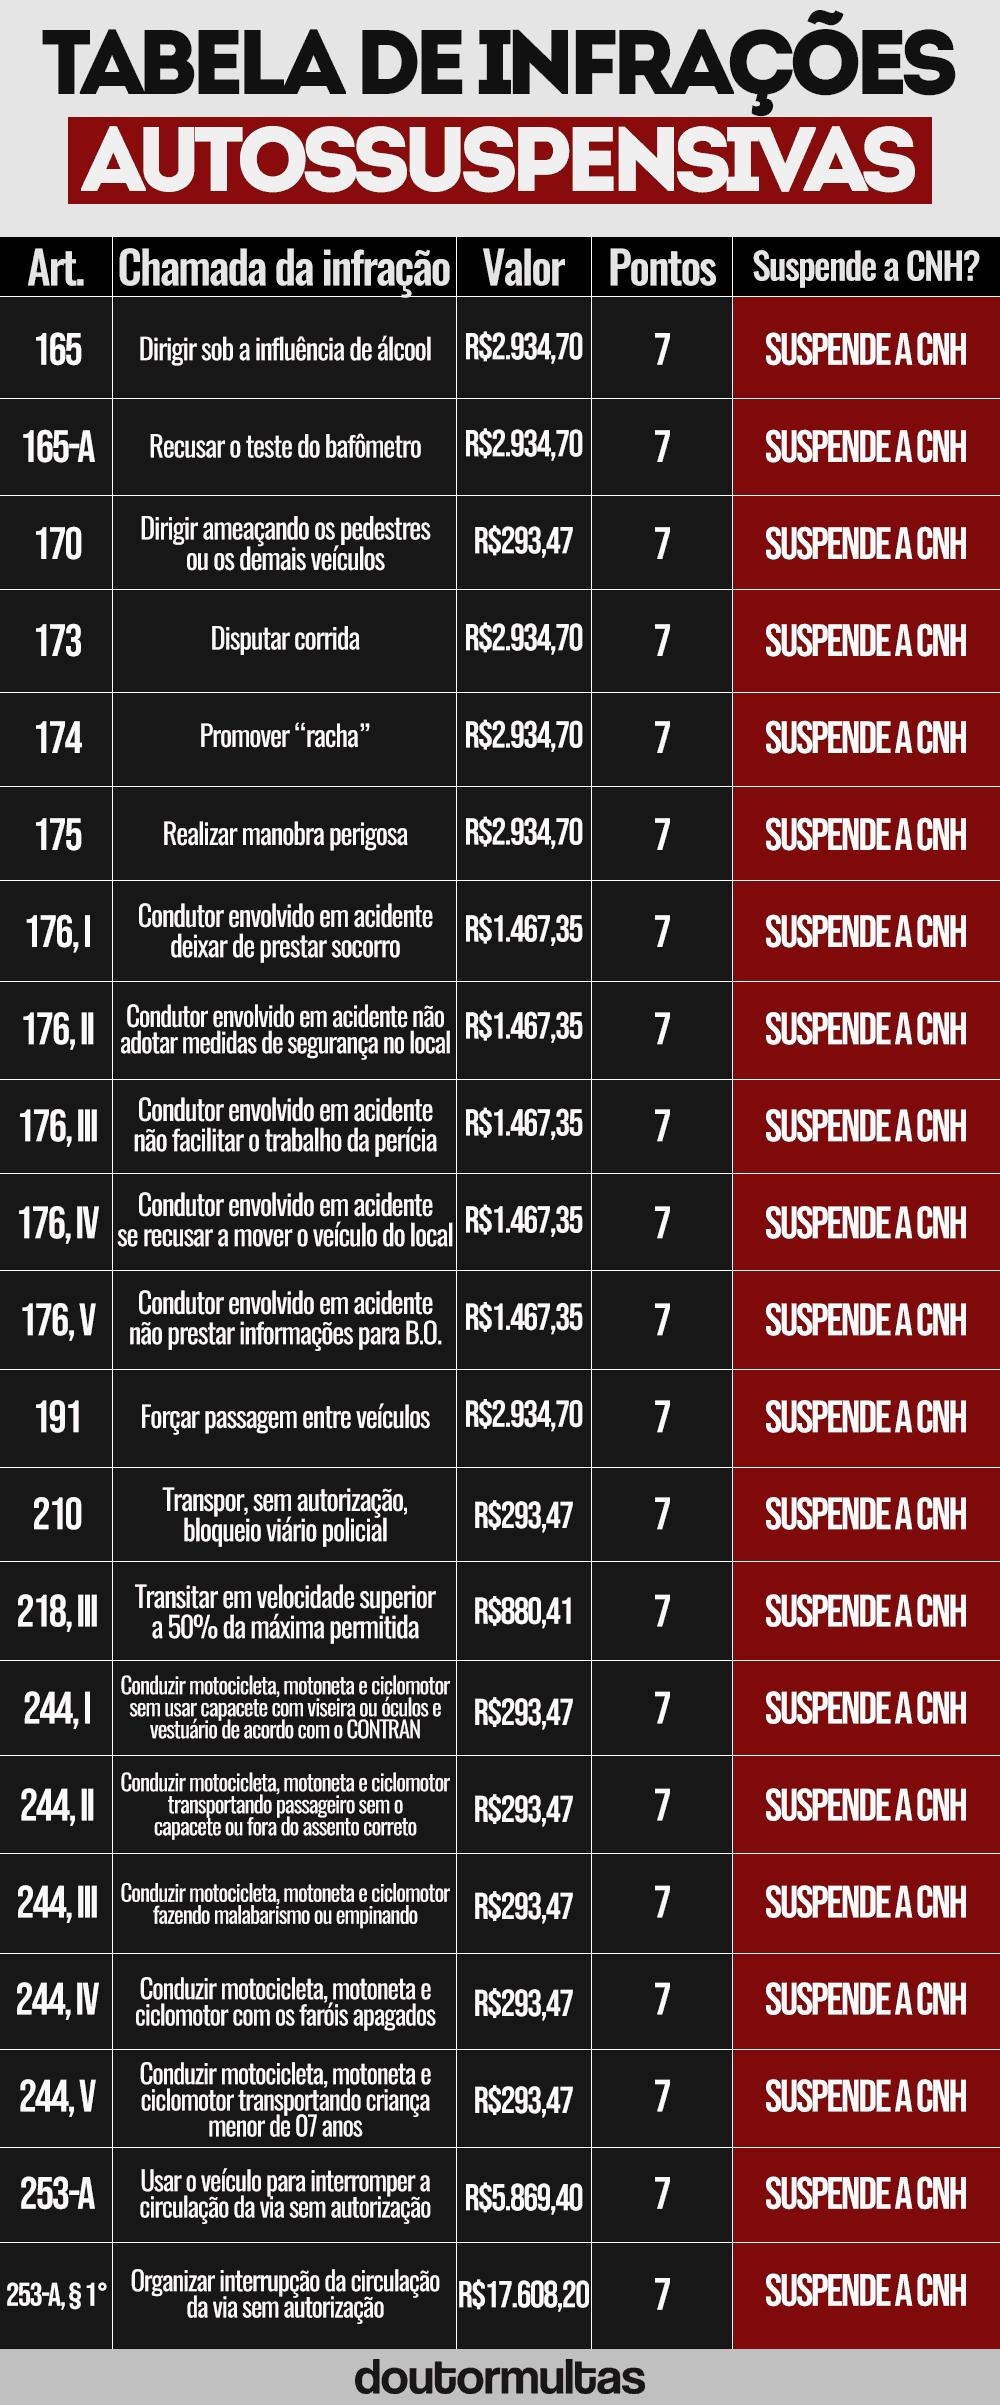 tabela infracoes autossuspensivas